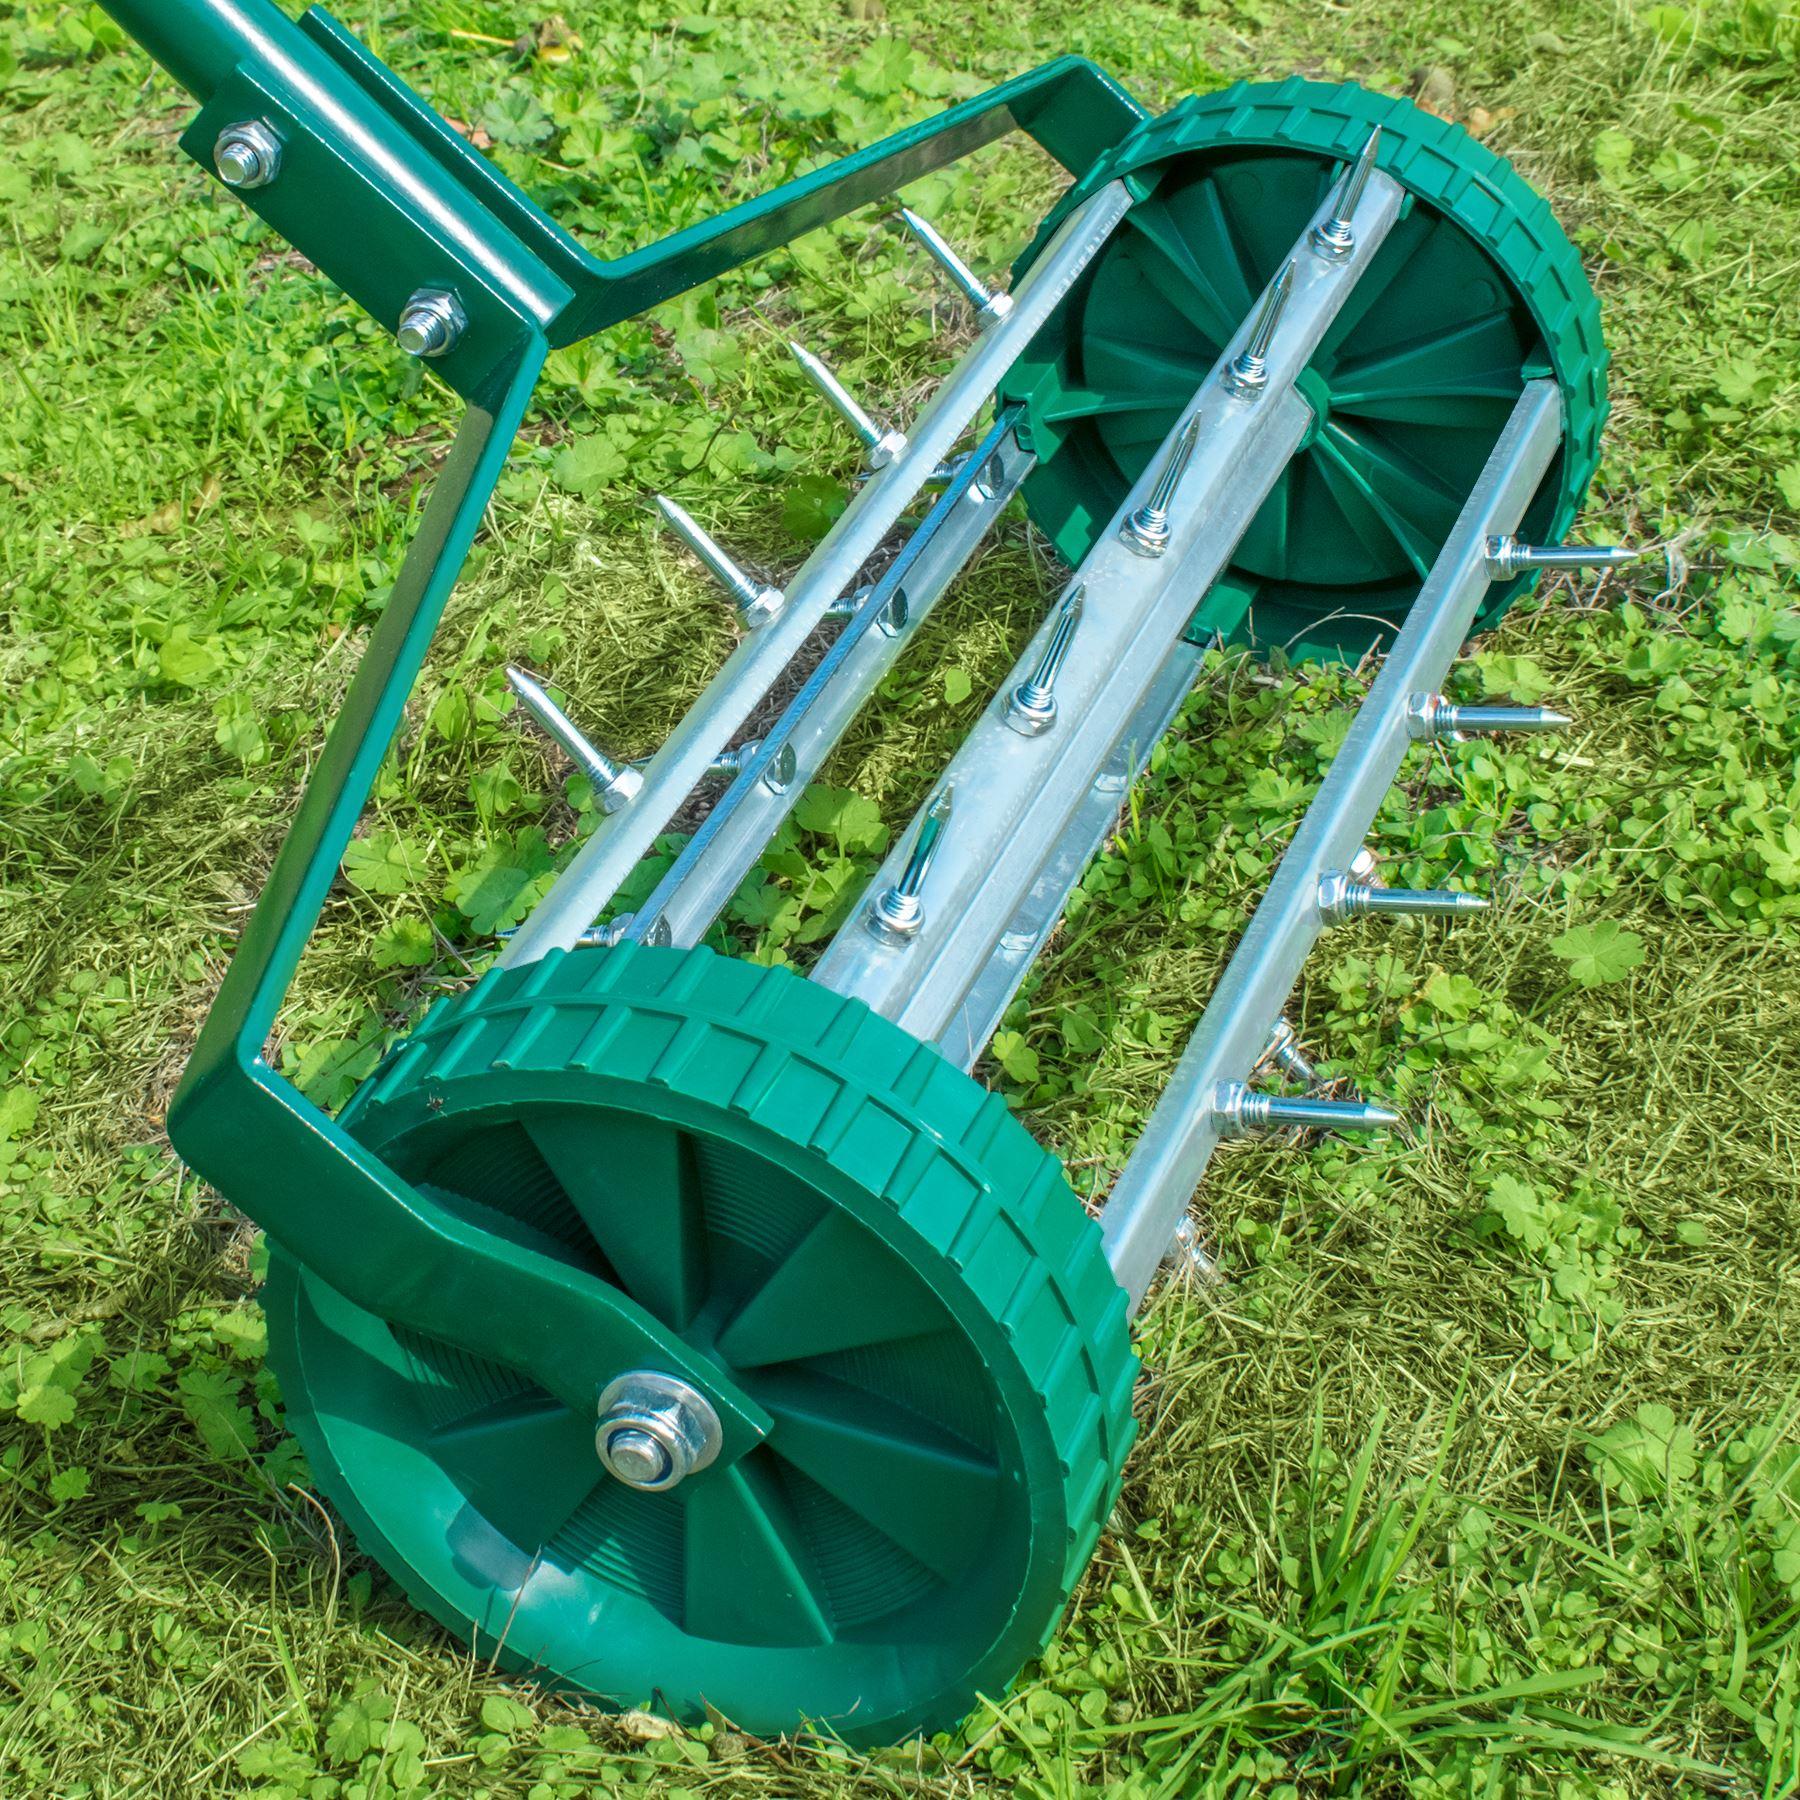 Outdoor Garden Lawn Aerator Spike Soil Roller Gardening